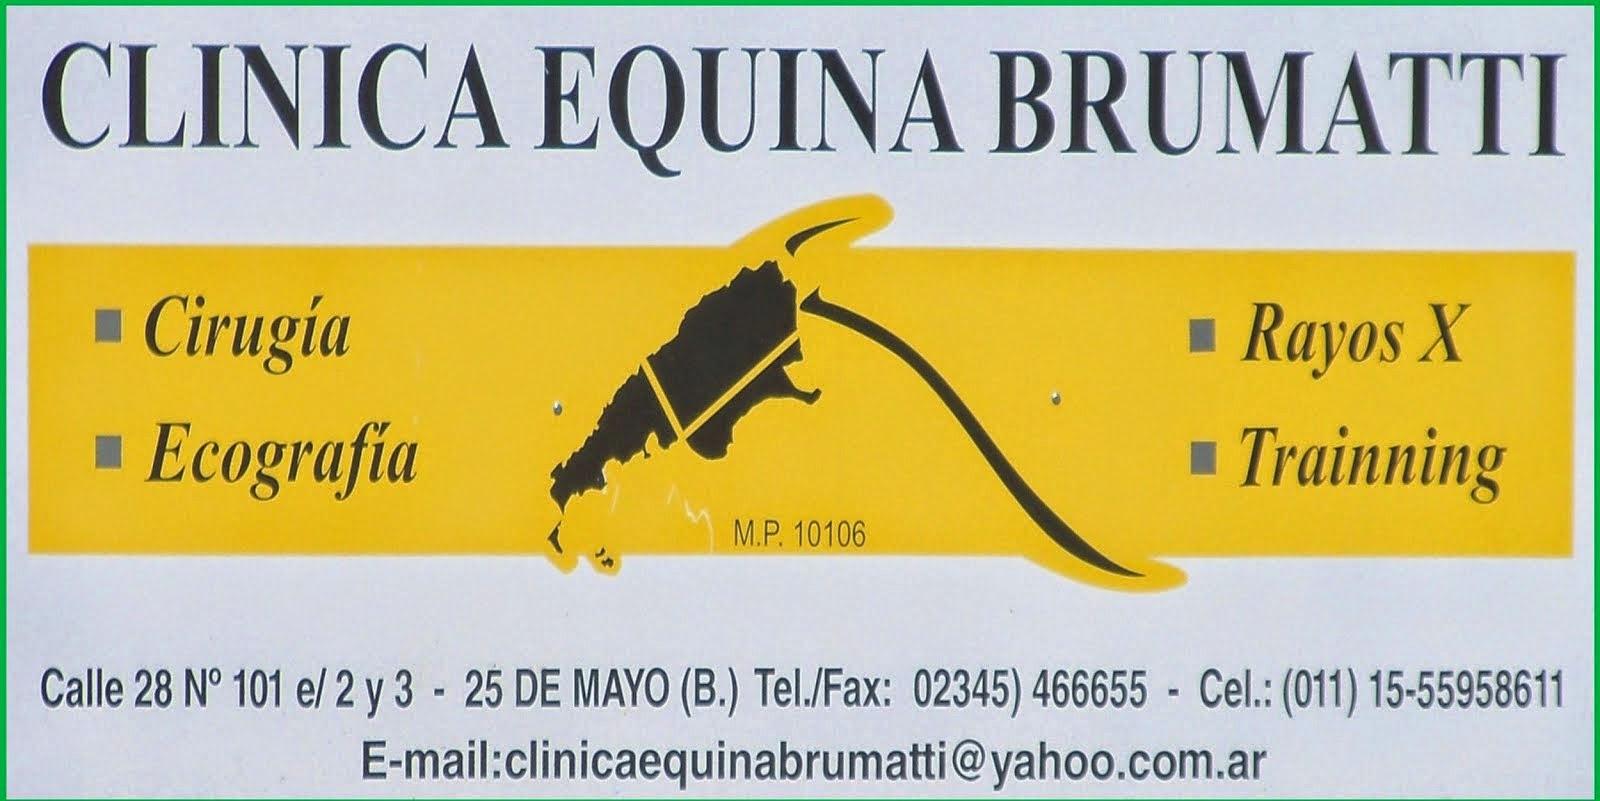 Clínica Brumatti